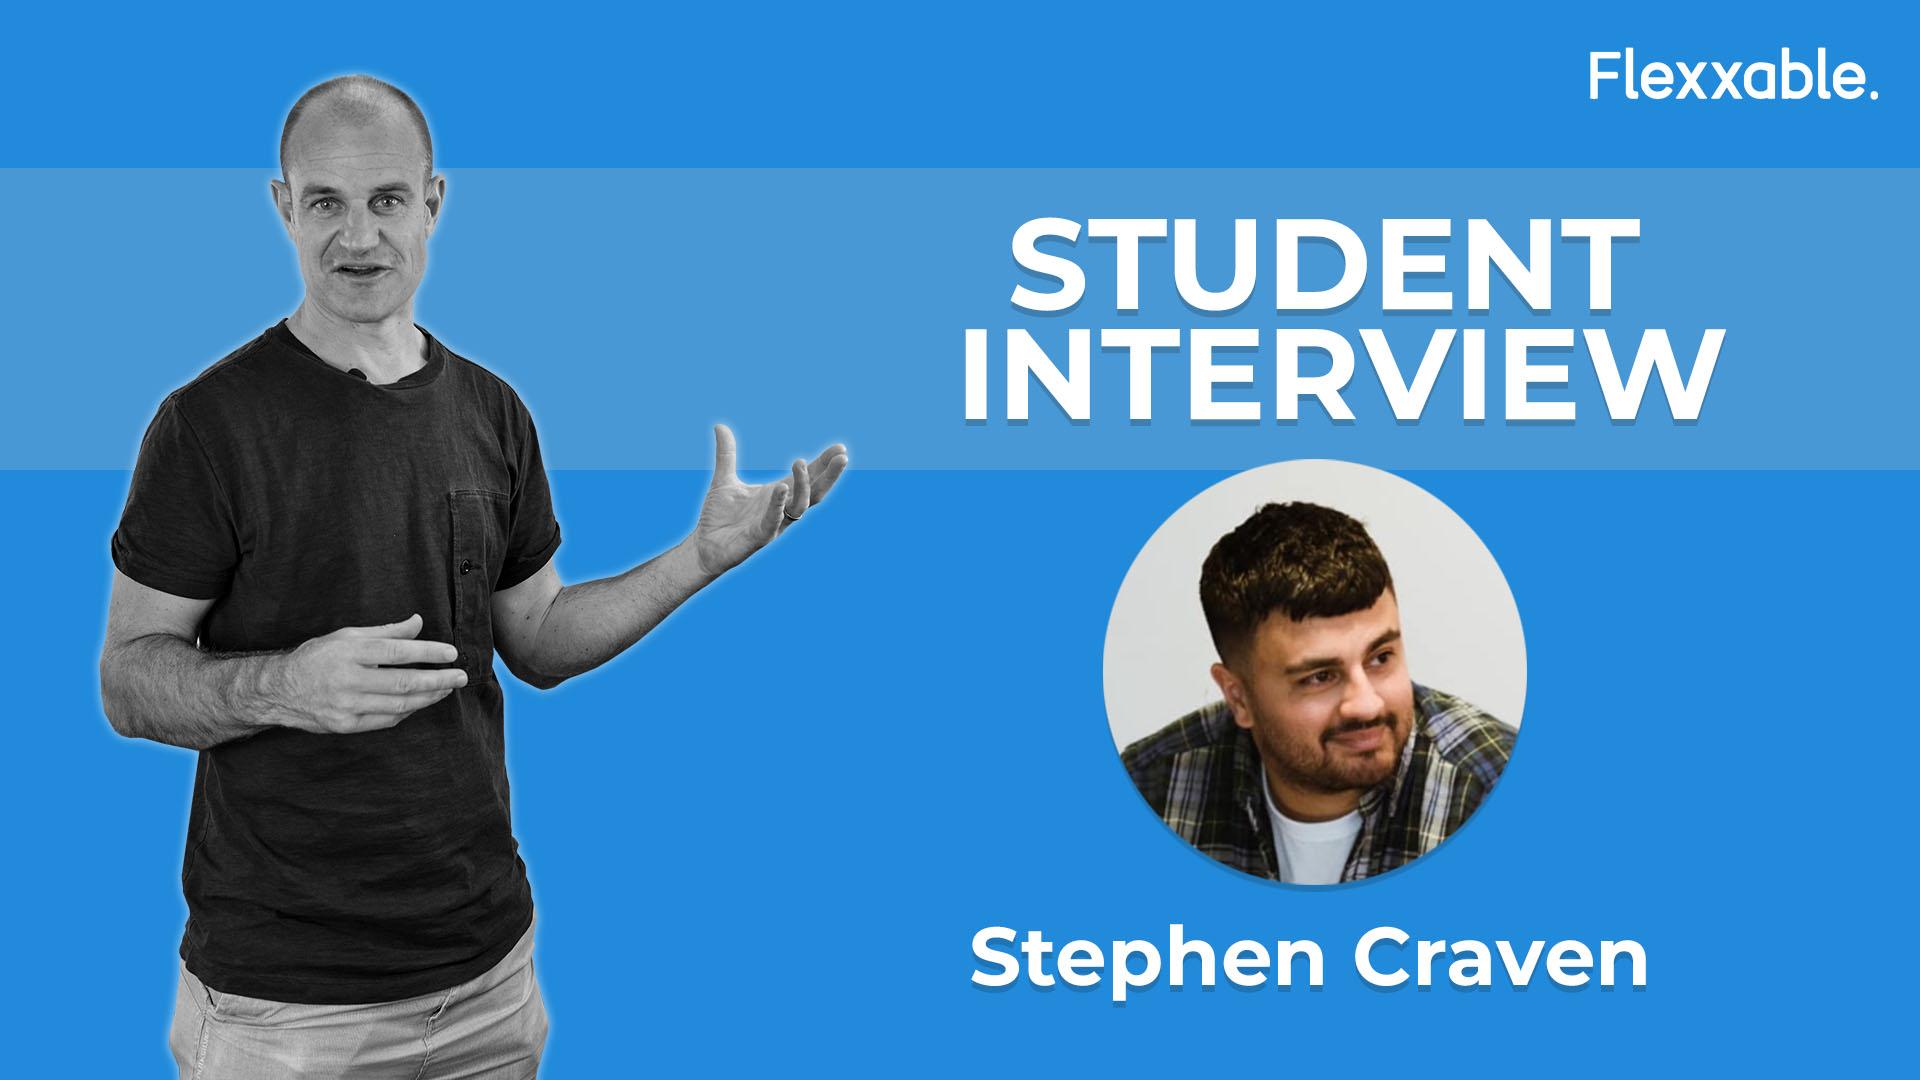 Stephen Craven